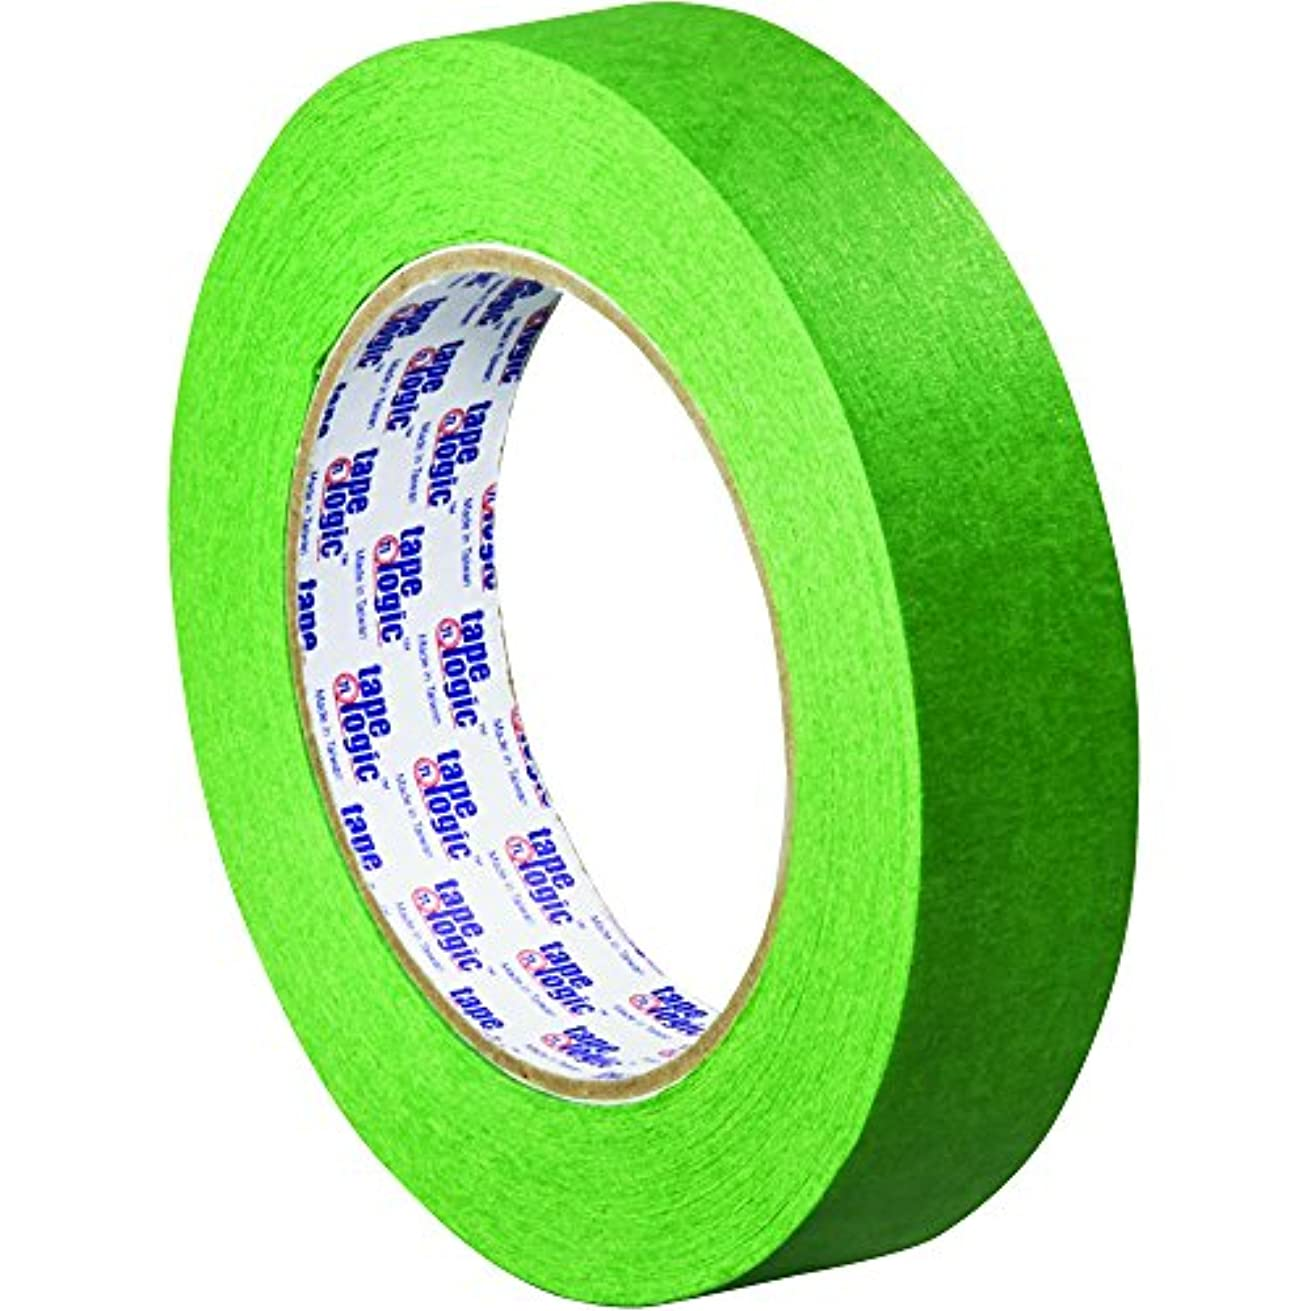 Partners Brand PT9353200 Tape Logic 3200 Painter's Tape, 1